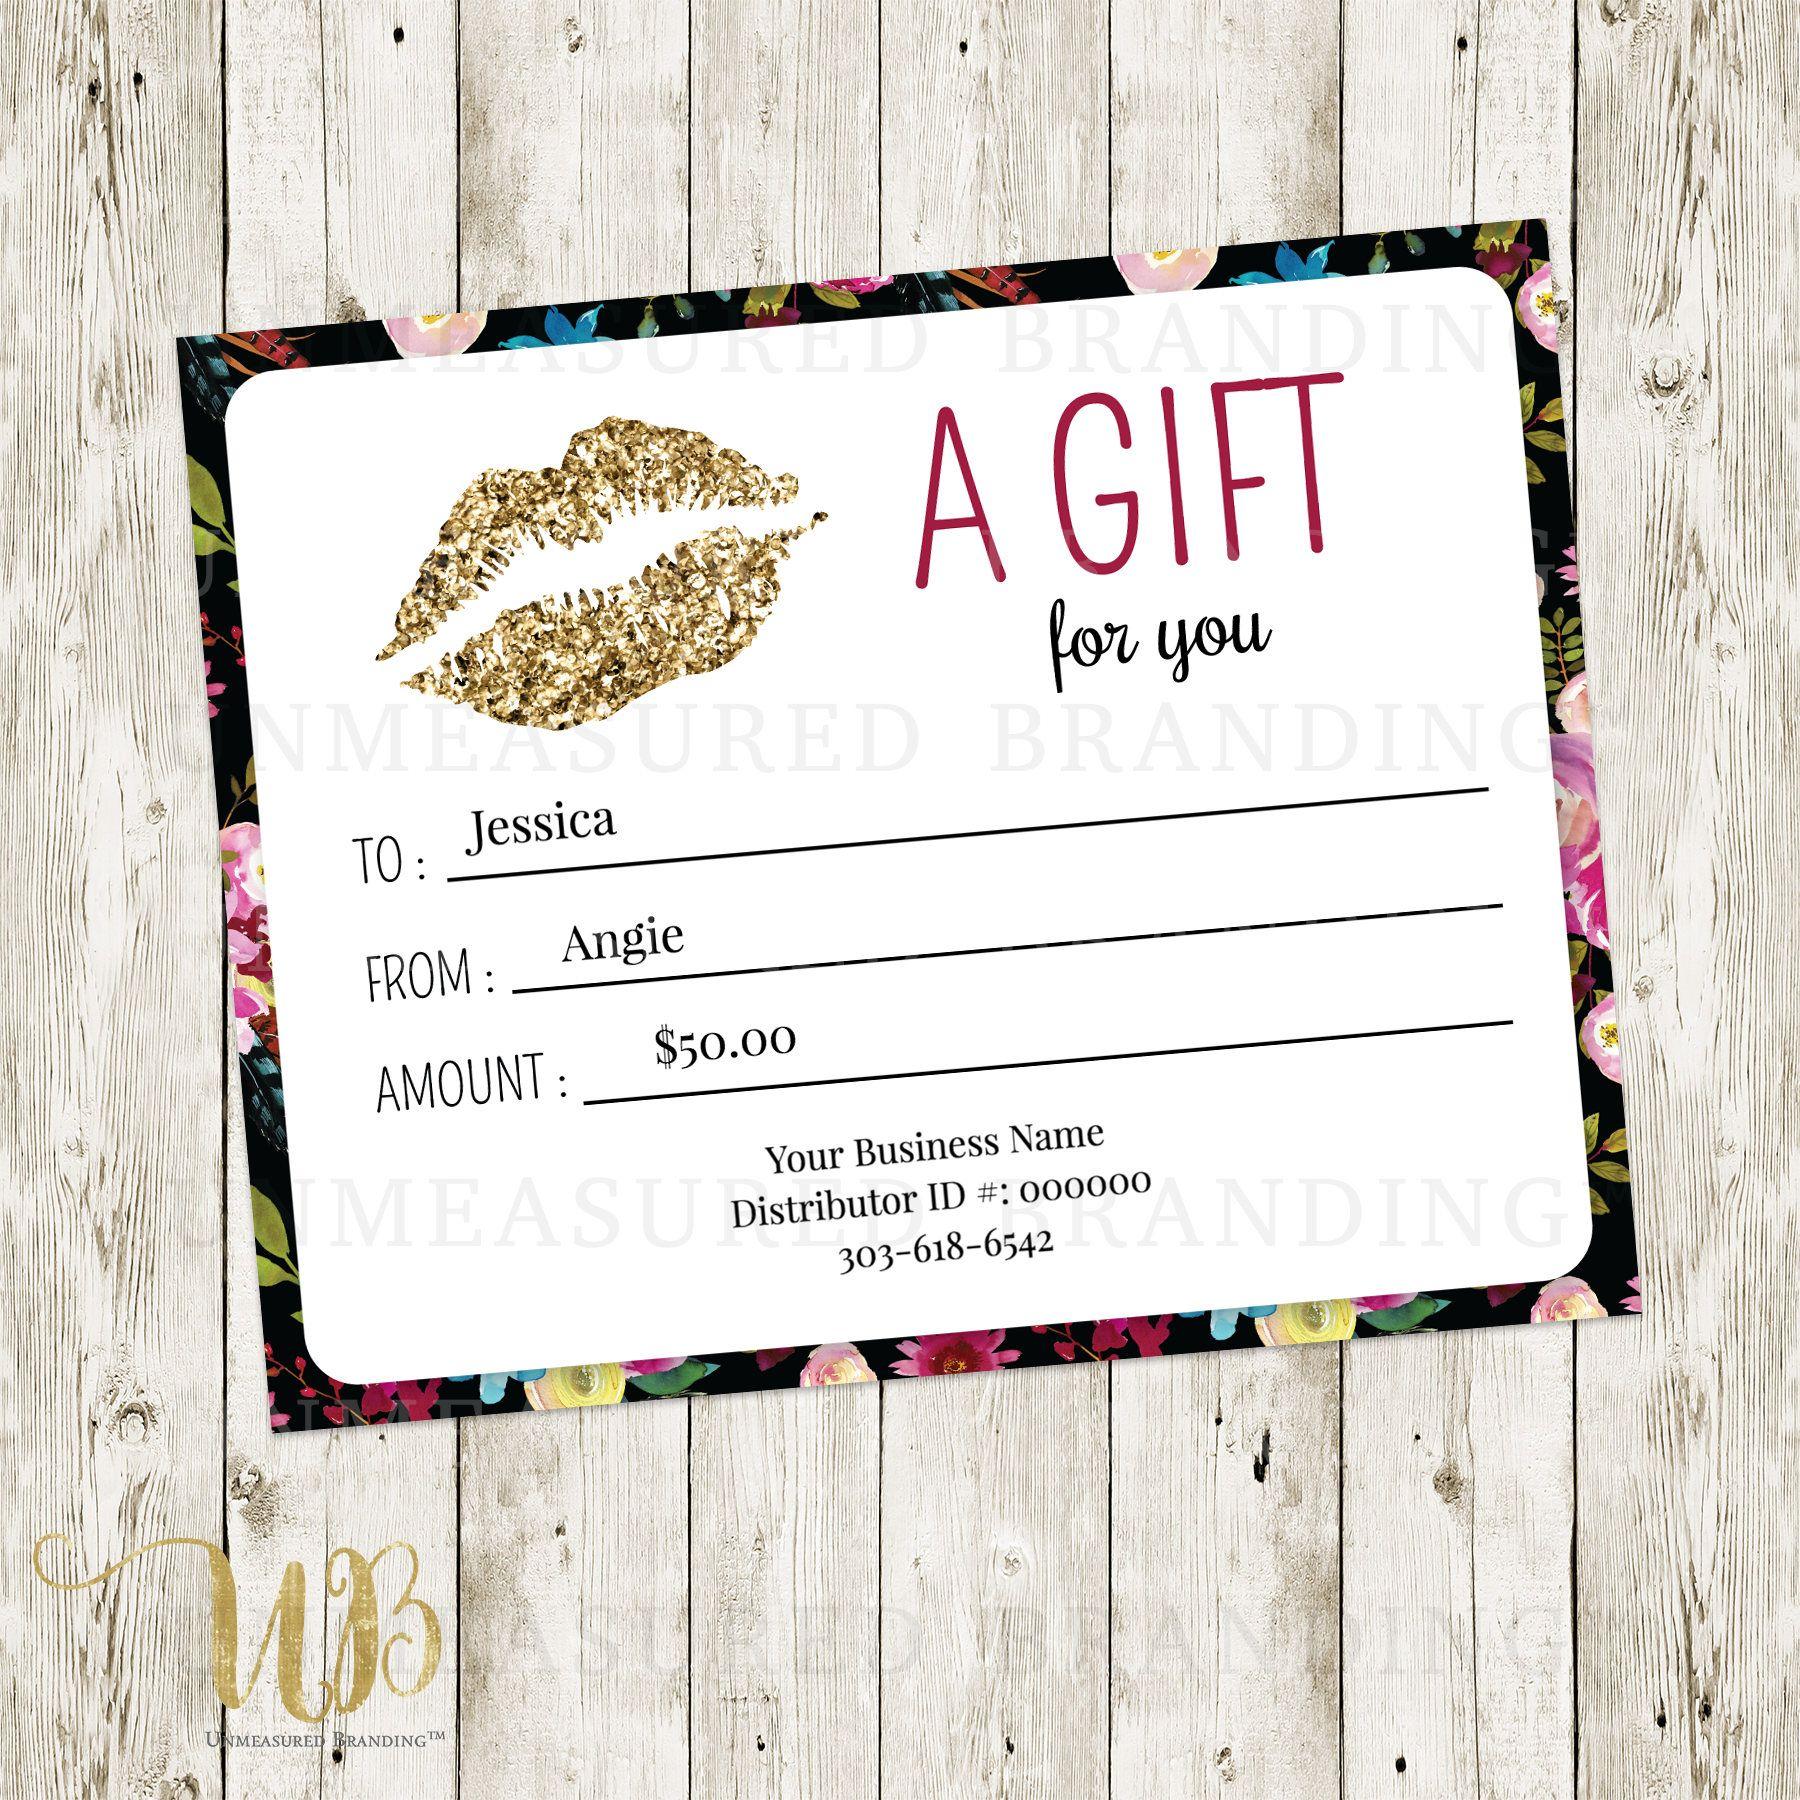 Floral|Black|Gold|Glitter|LipSense Gift Certificate|LipSense Gift ...